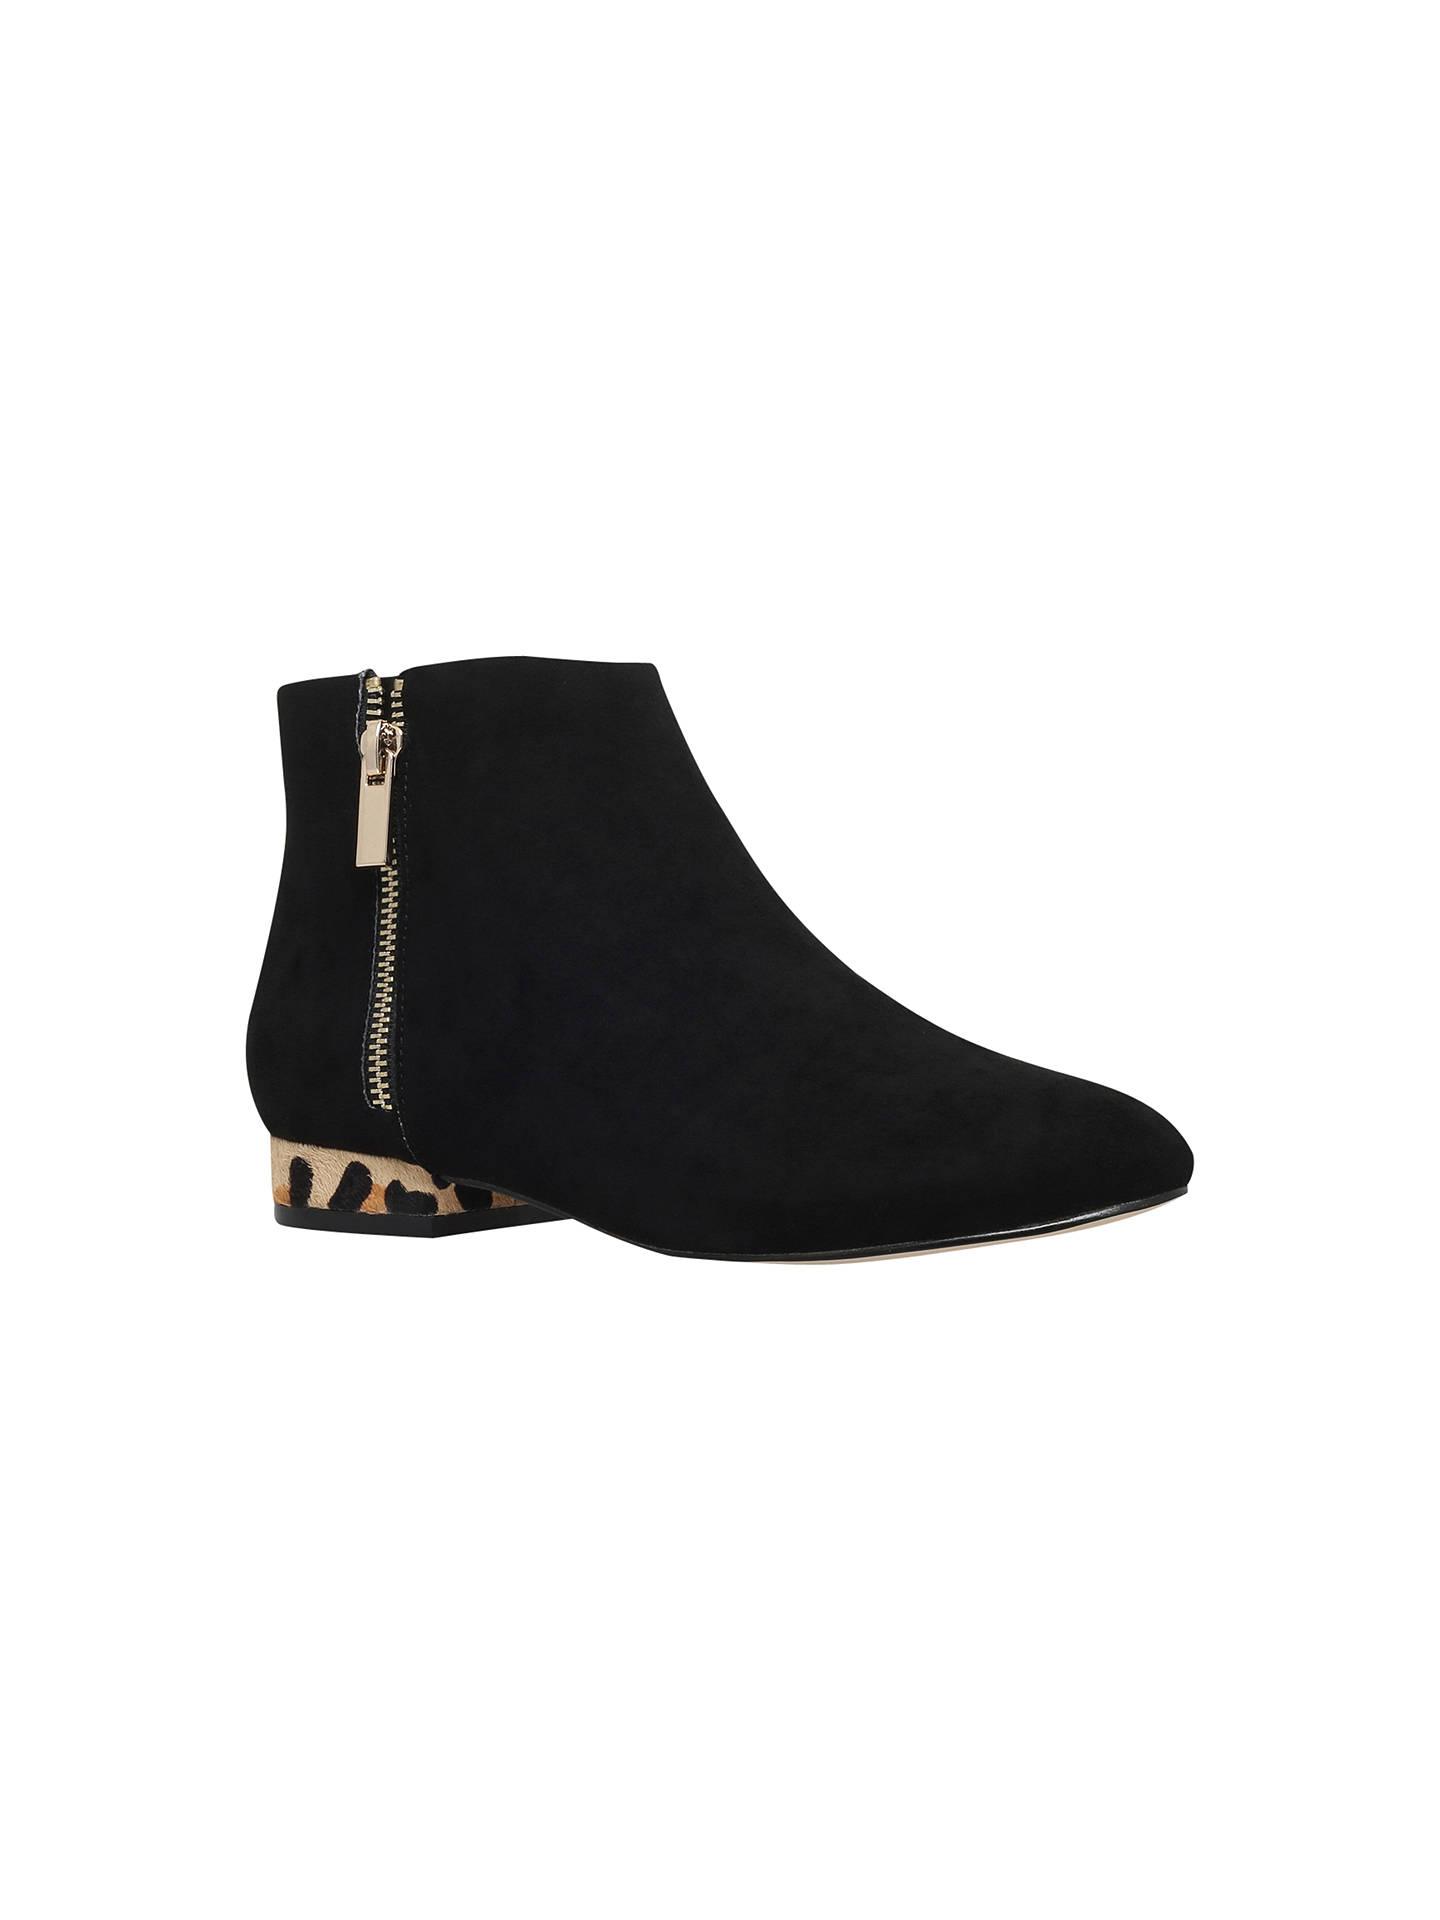 6316b3ecff9ab Buy Miss KG Soho Low Heel Ankle Boots